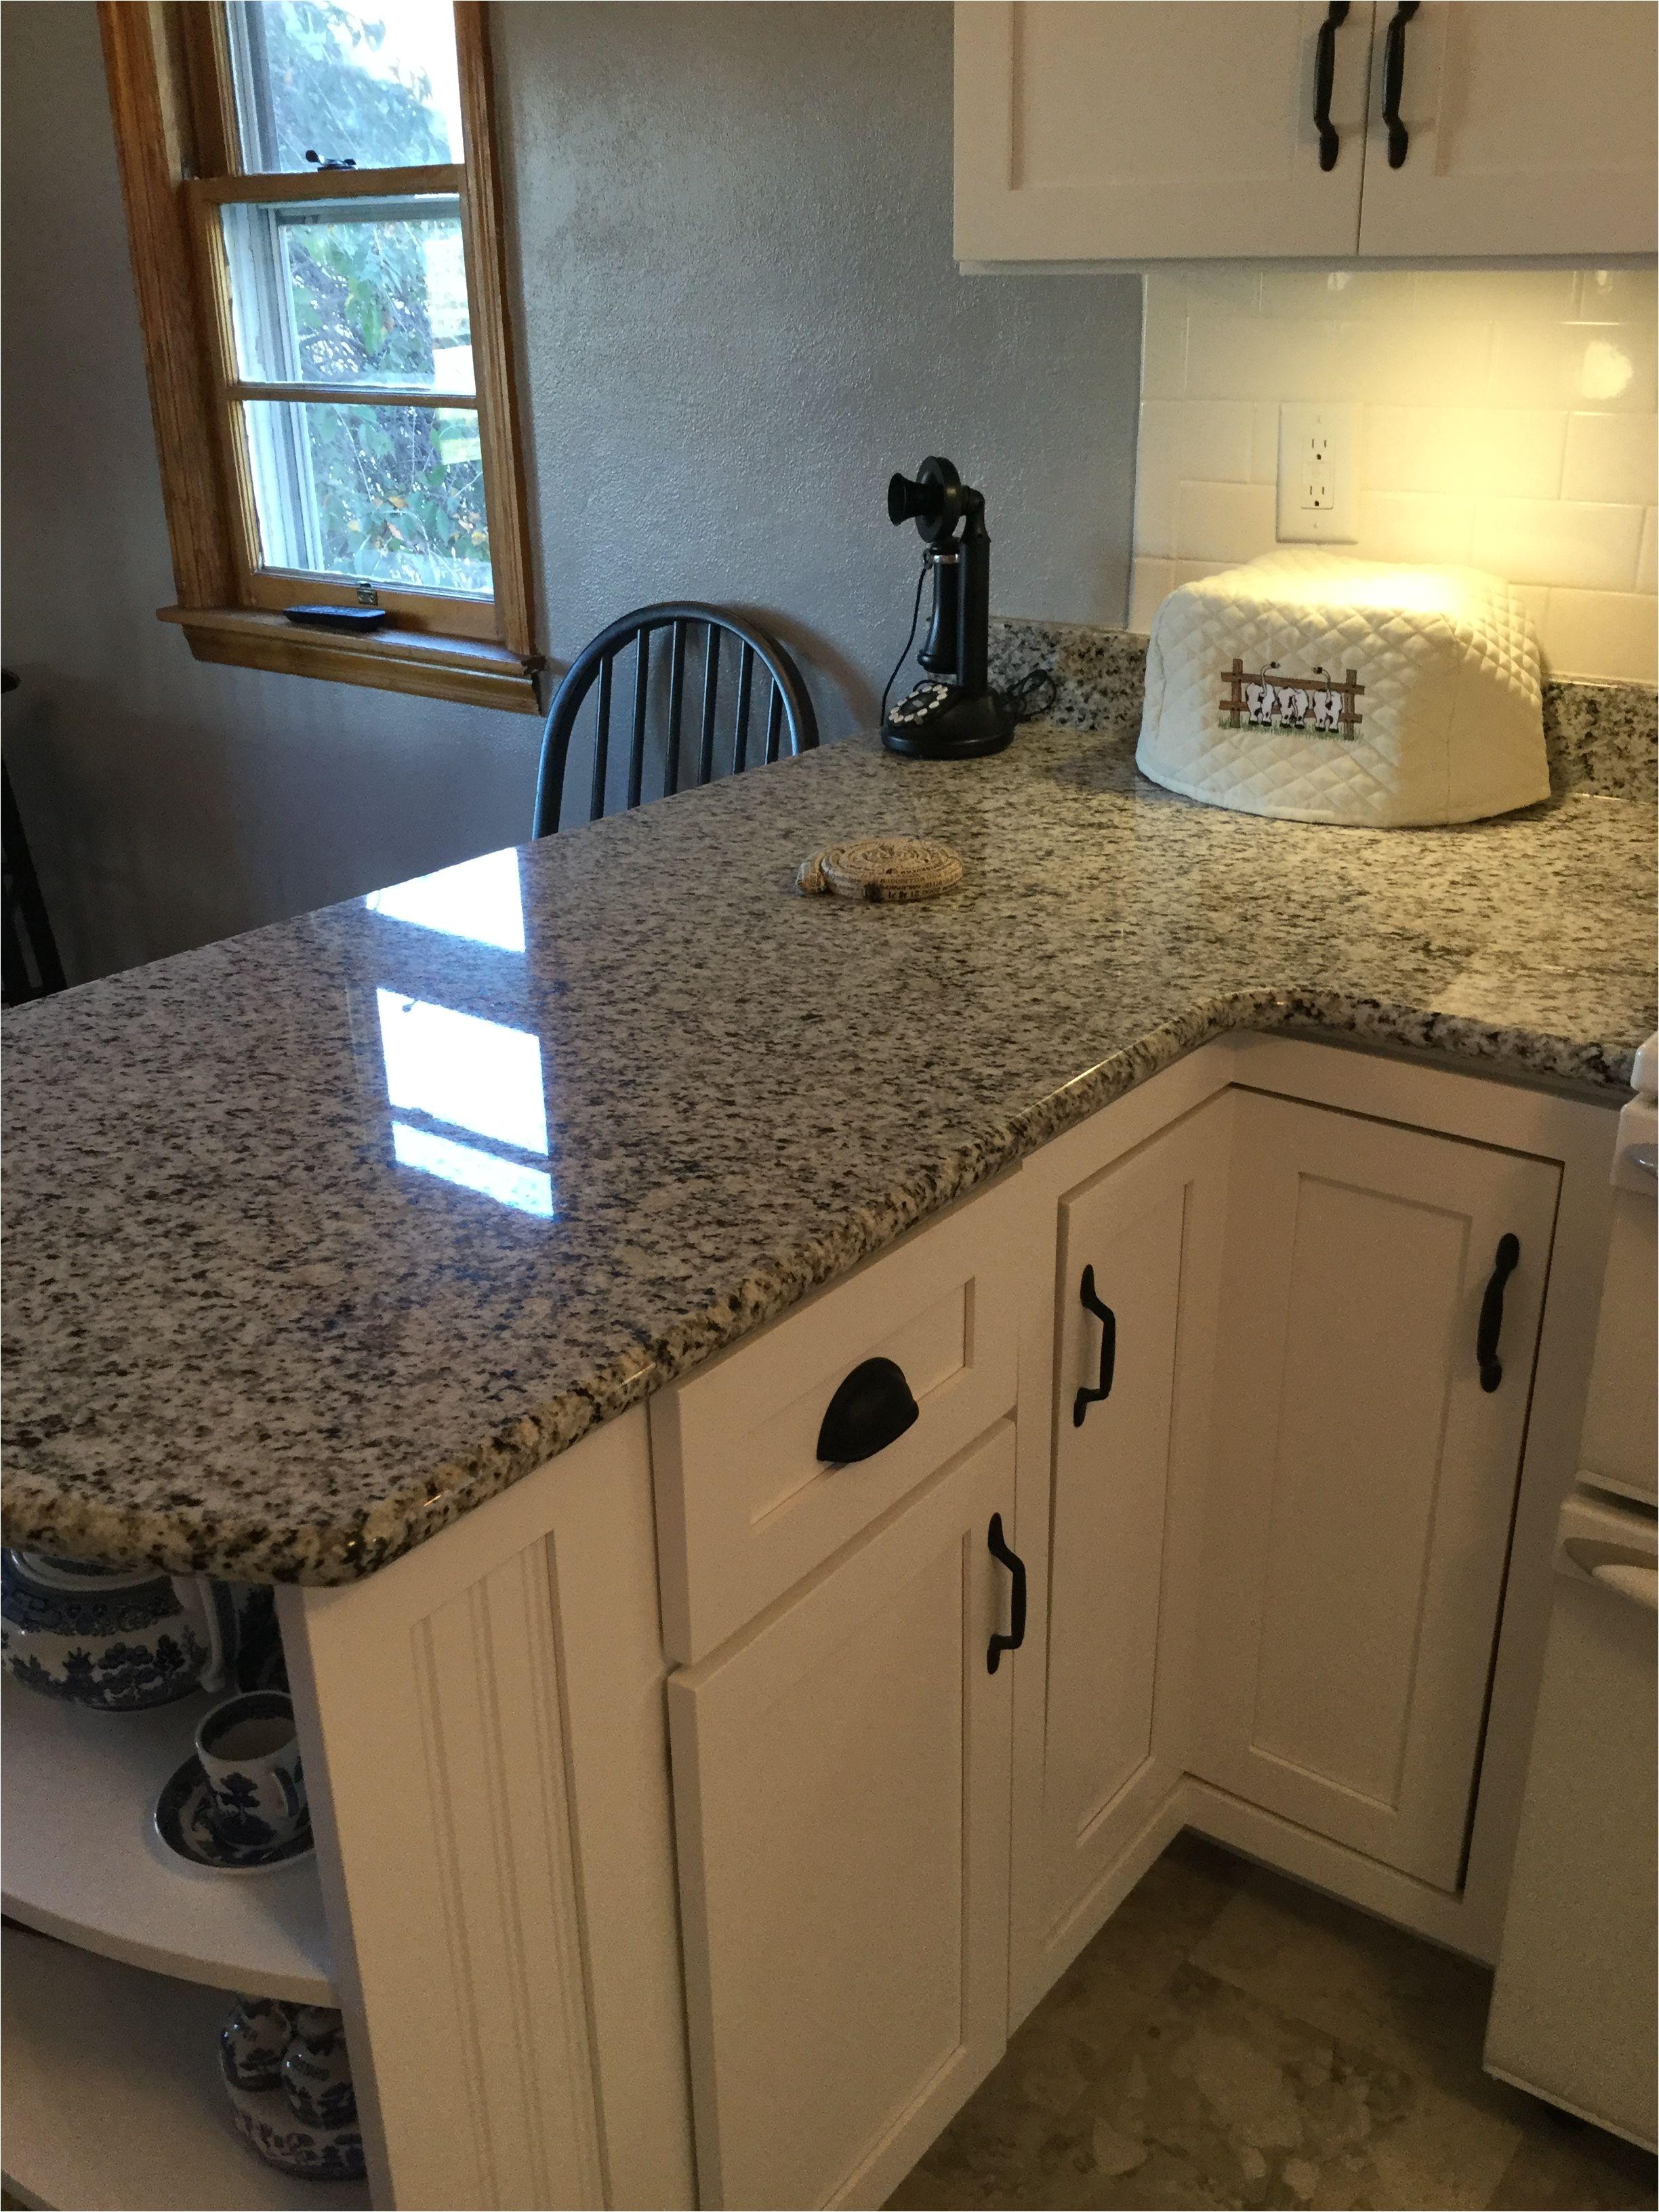 valle nevado granite classic marble stone hoagland in kitchen tops kitchen decor